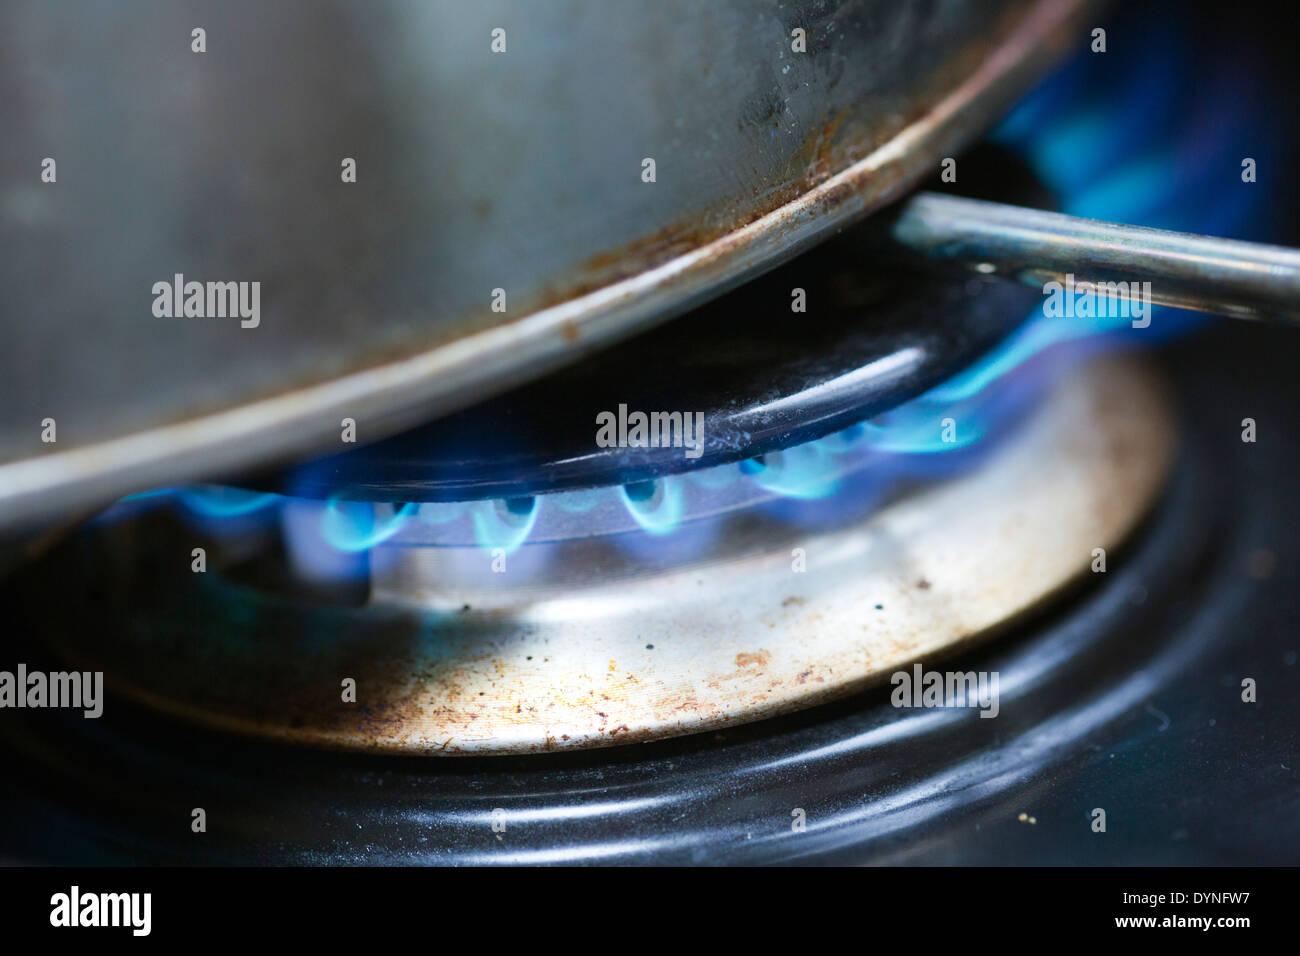 Burning Gas; Cooker; UK - Stock Image